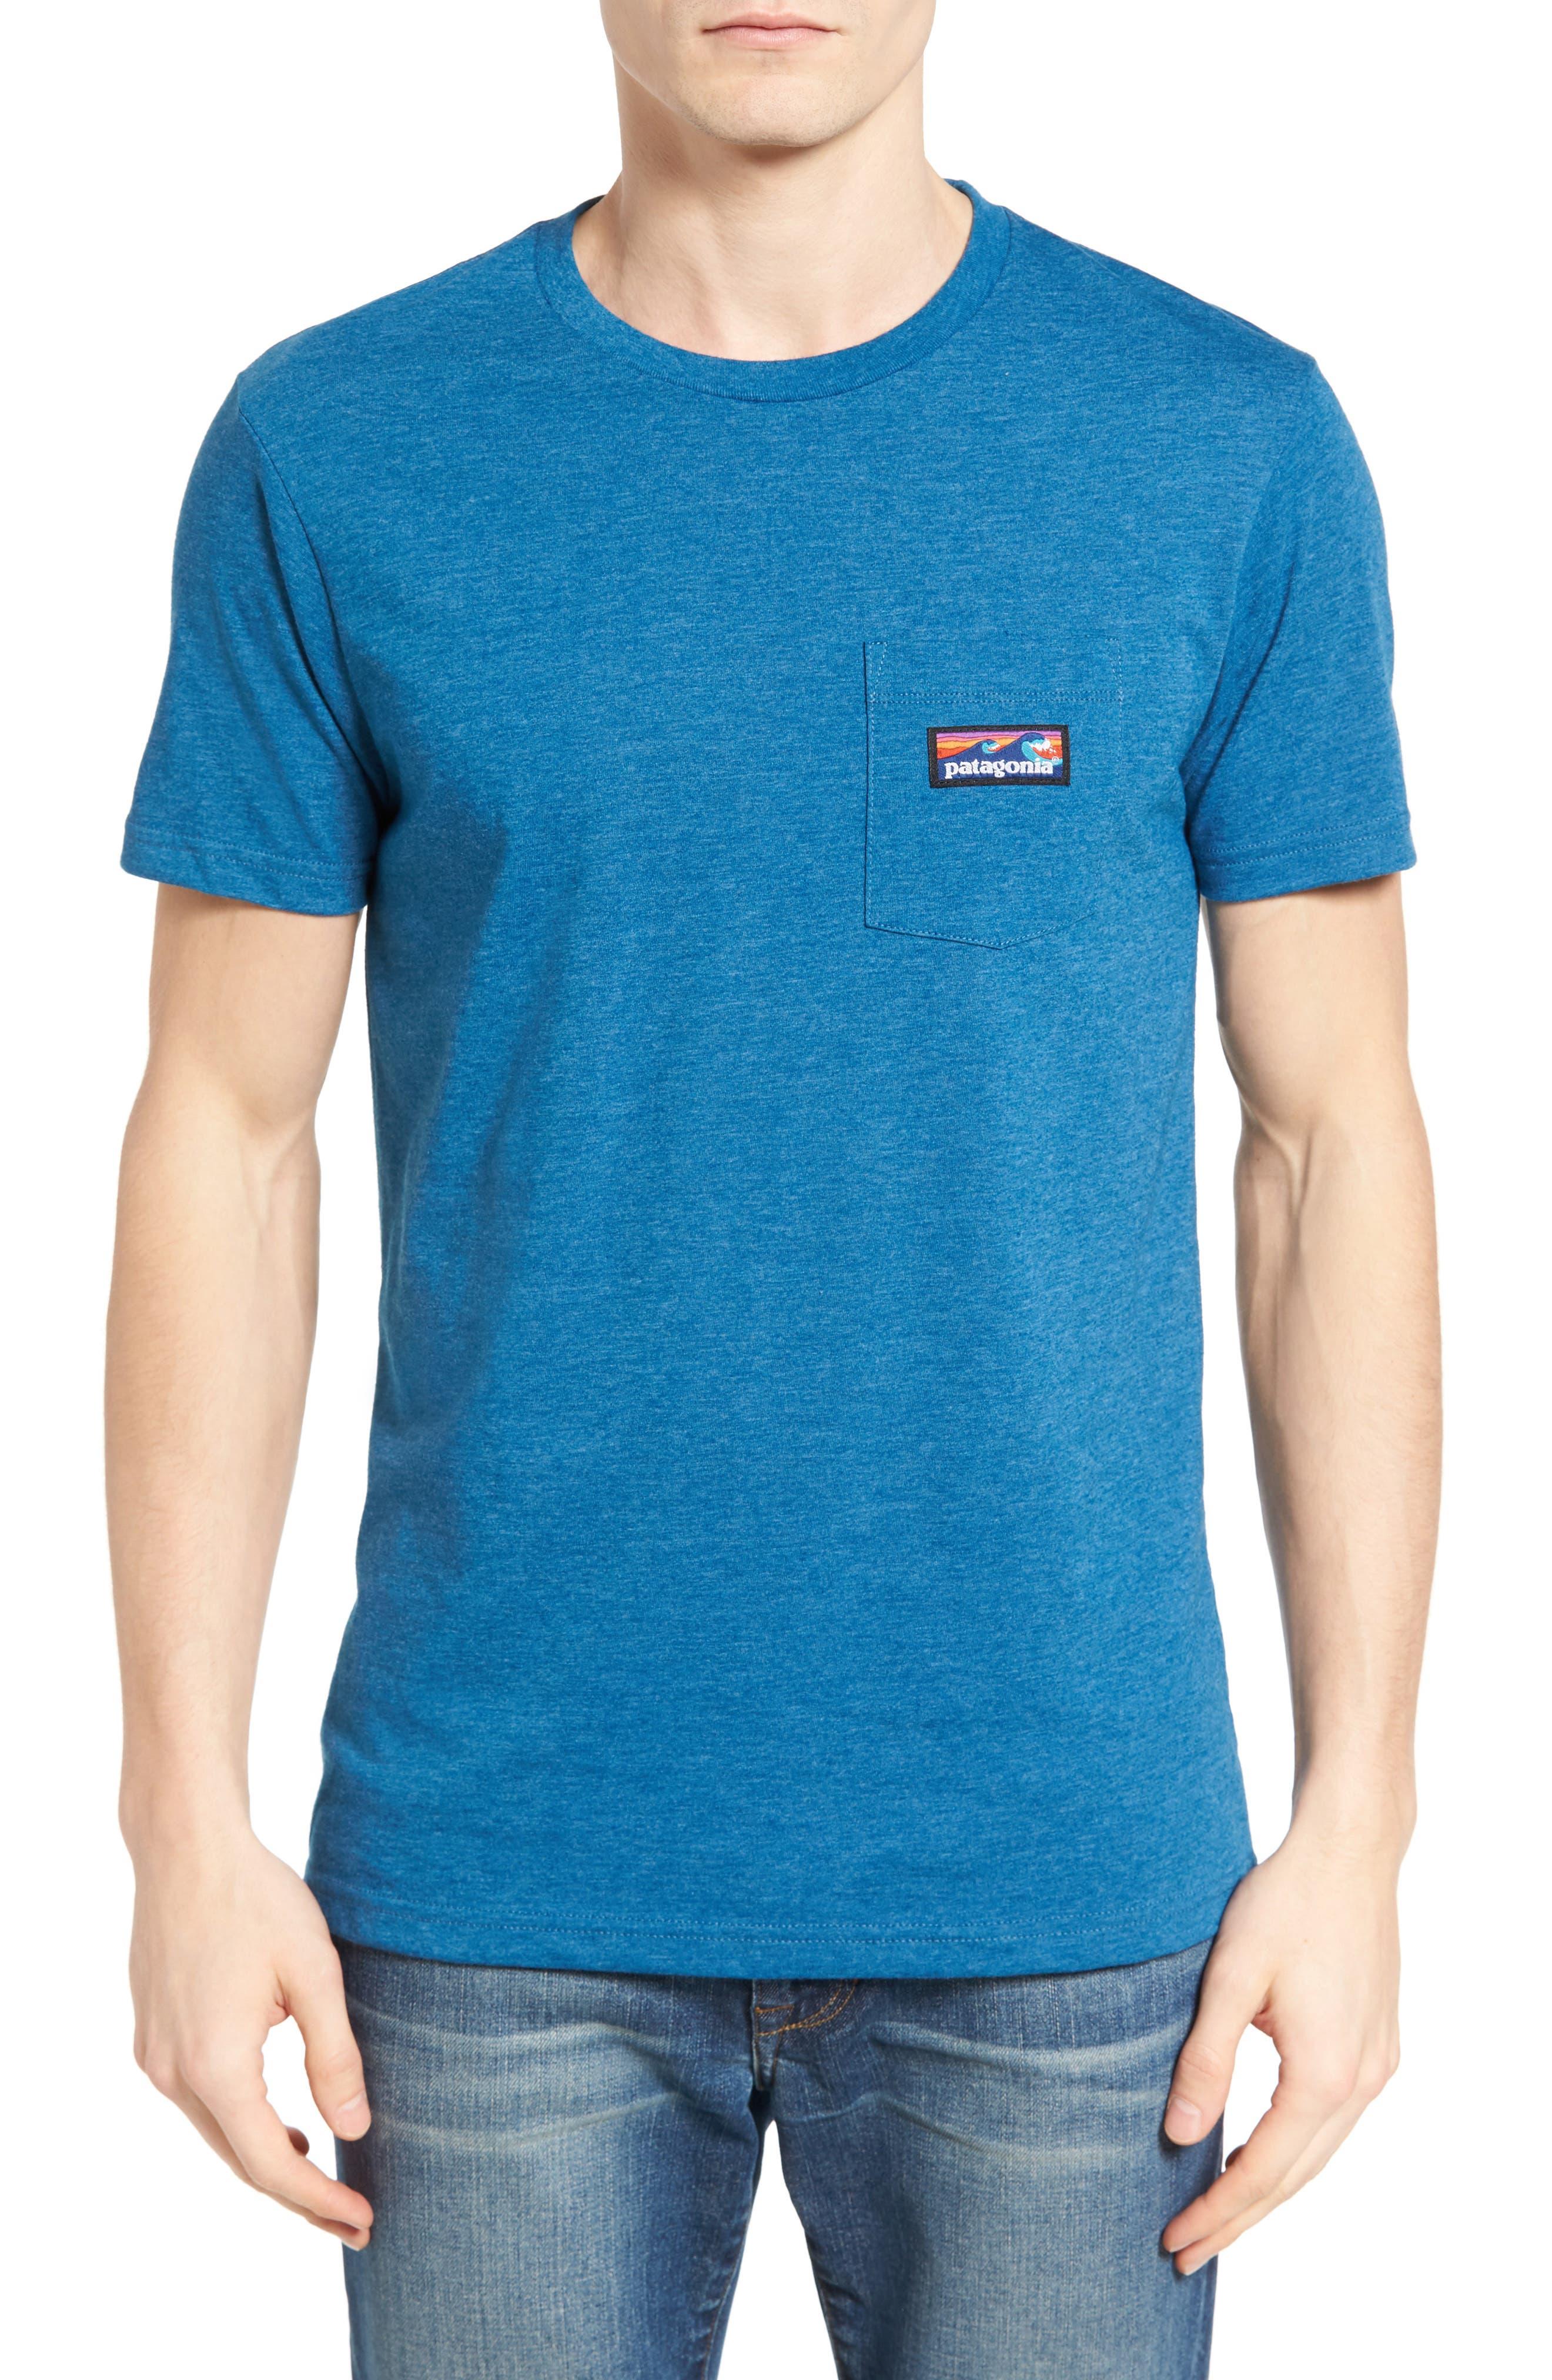 Board Short Label T-Shirt,                         Main,                         color, Blue